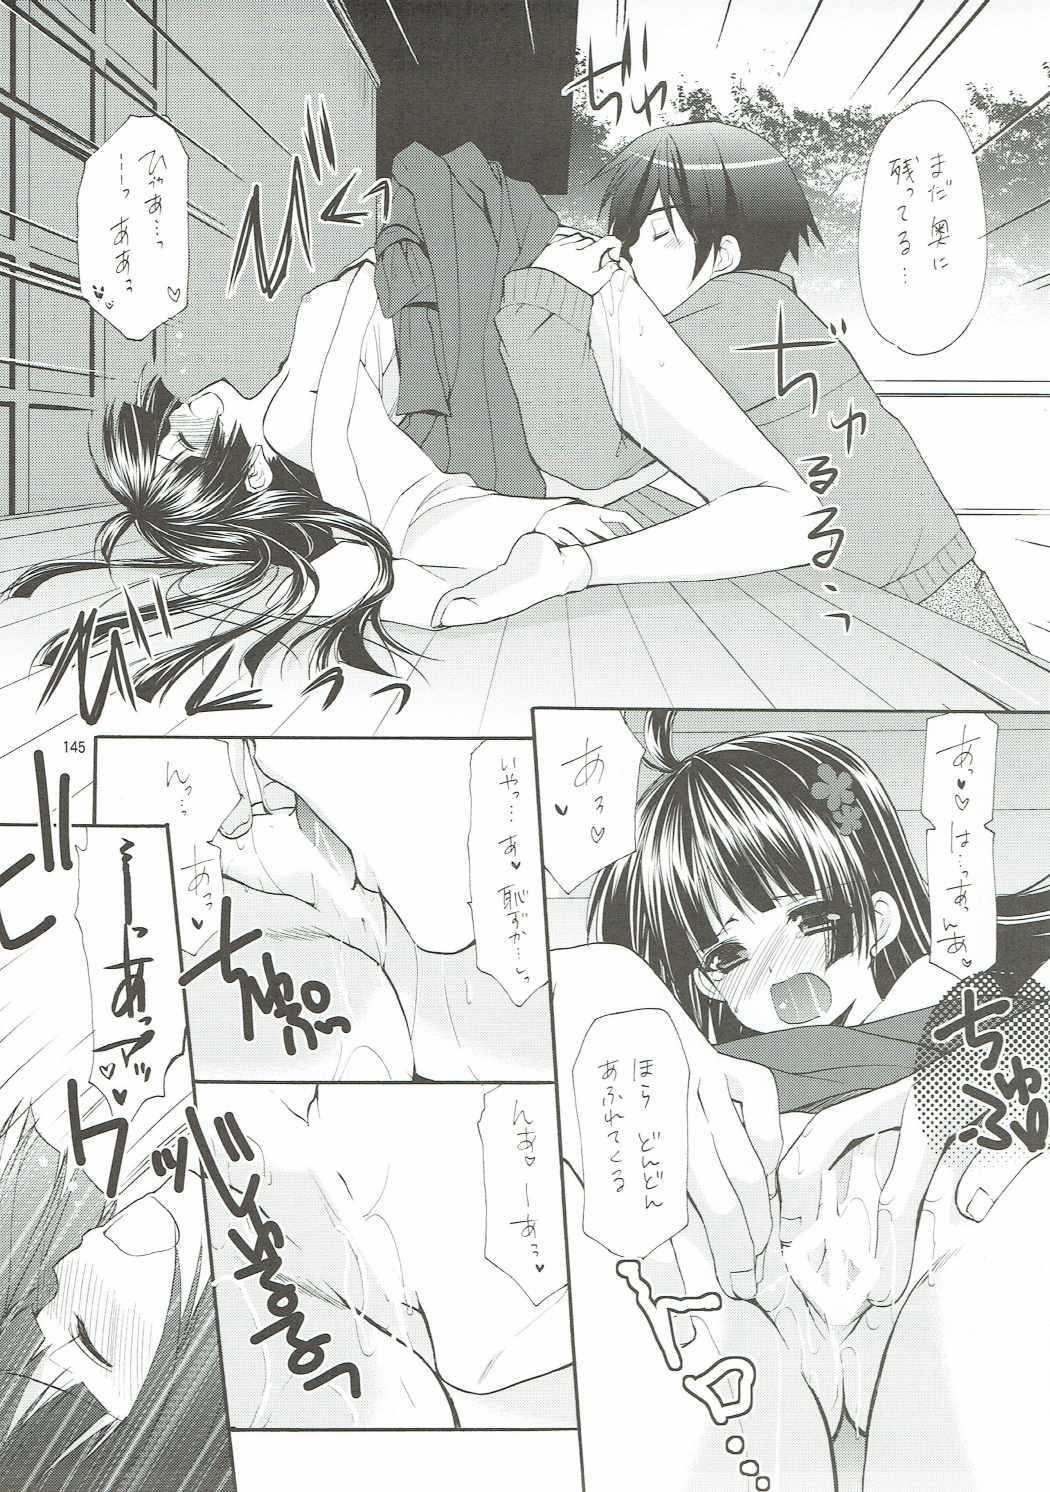 ANIME COLLECTION Imomuya Honpo - Singleton Anime Soushuuhen 143